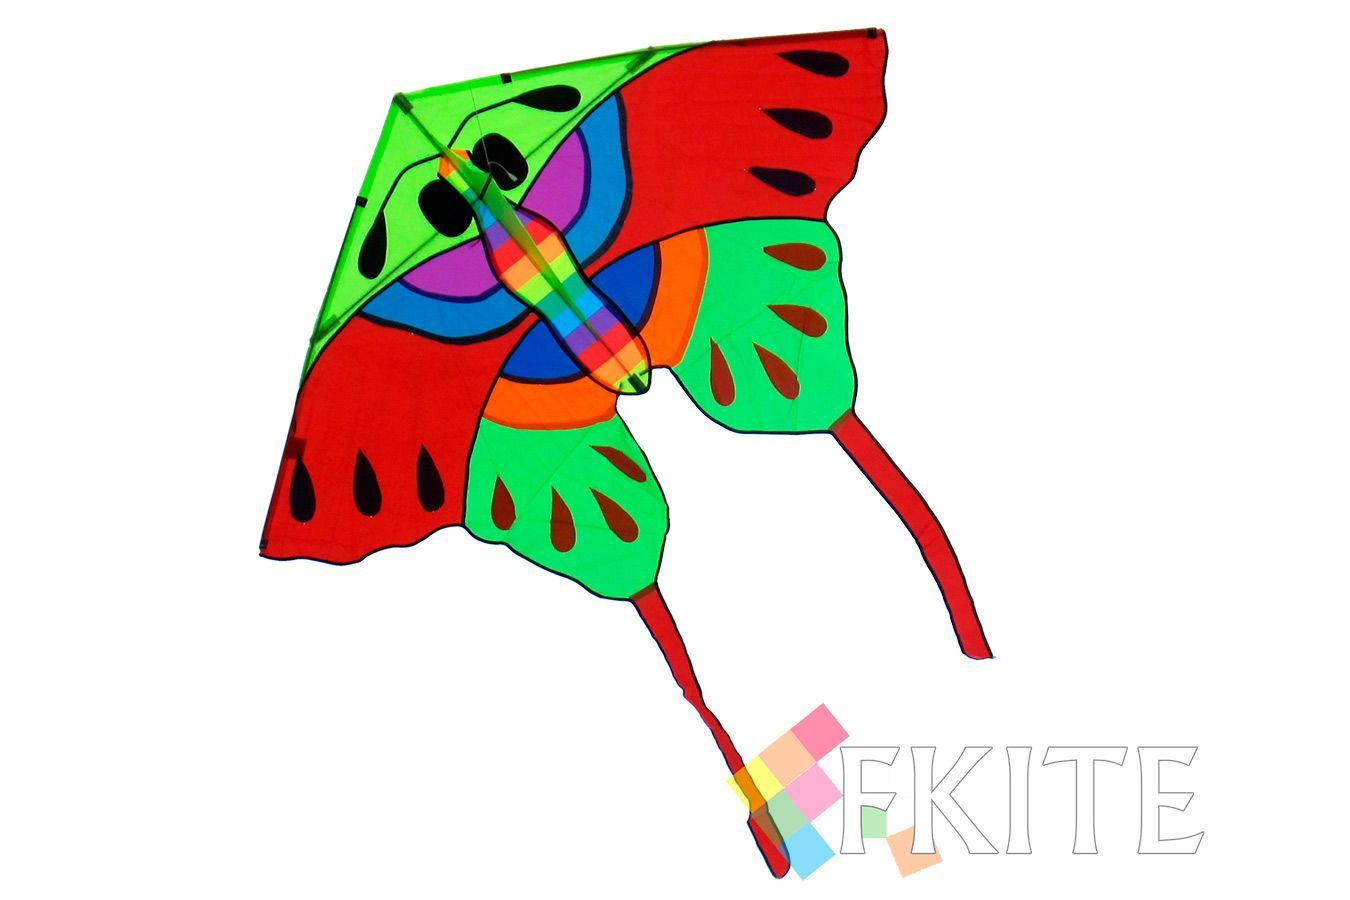 Красная Аталия, воздушный змей бабочка [ZBTK021]